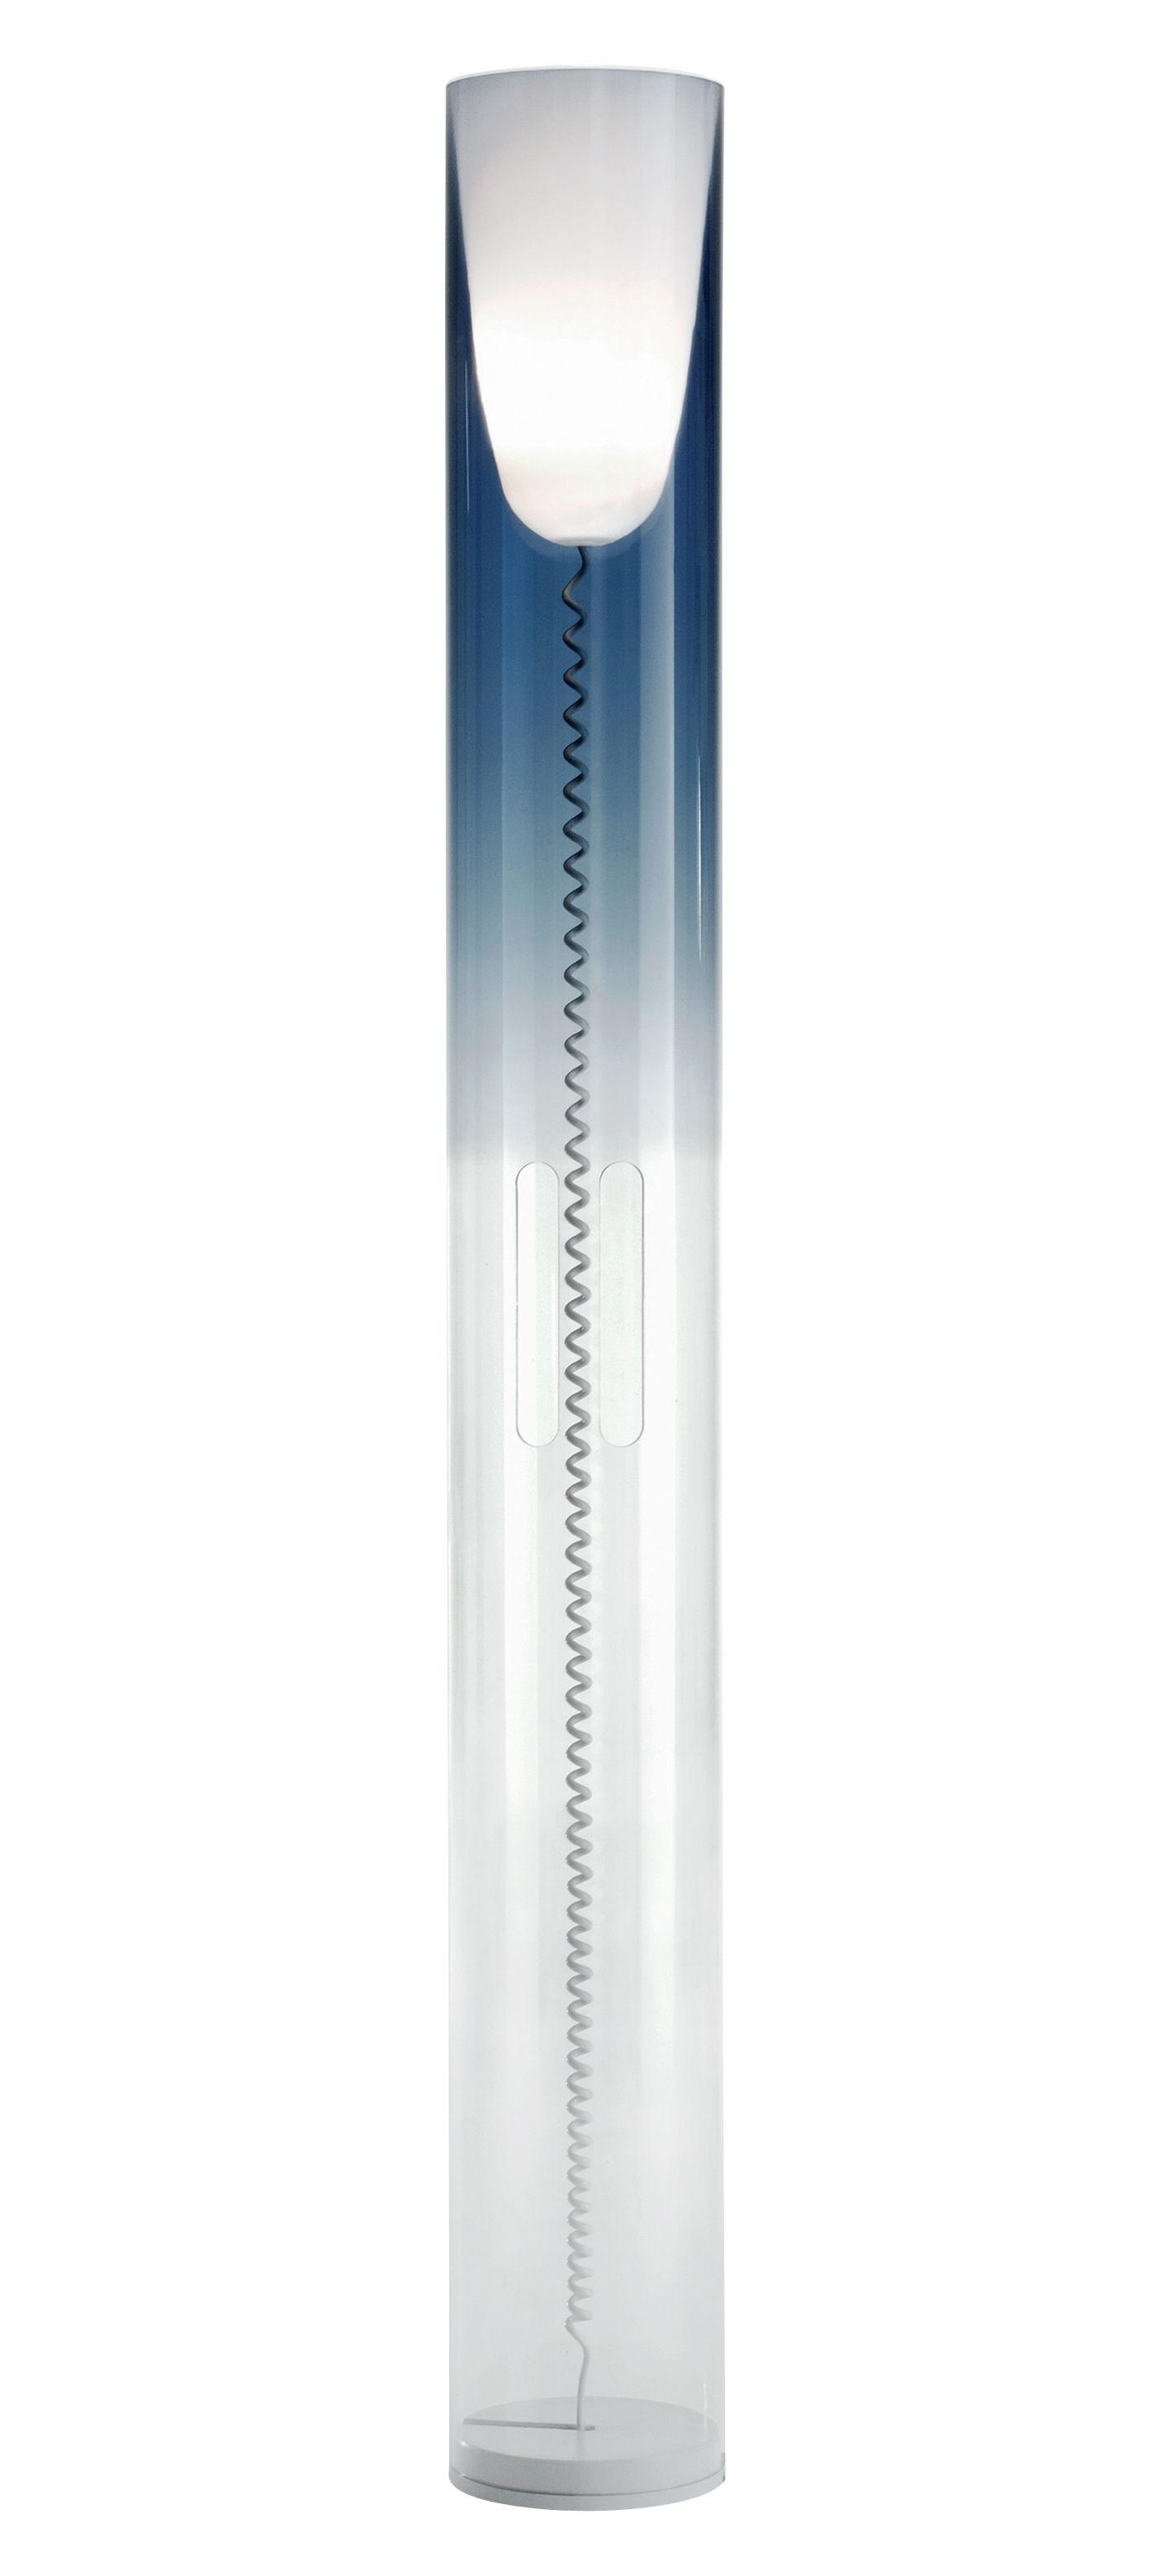 Luminaire - Lampadaires - Lampadaire Toobe - Kartell - Bleu ciel - PMMA, Polycarbonate